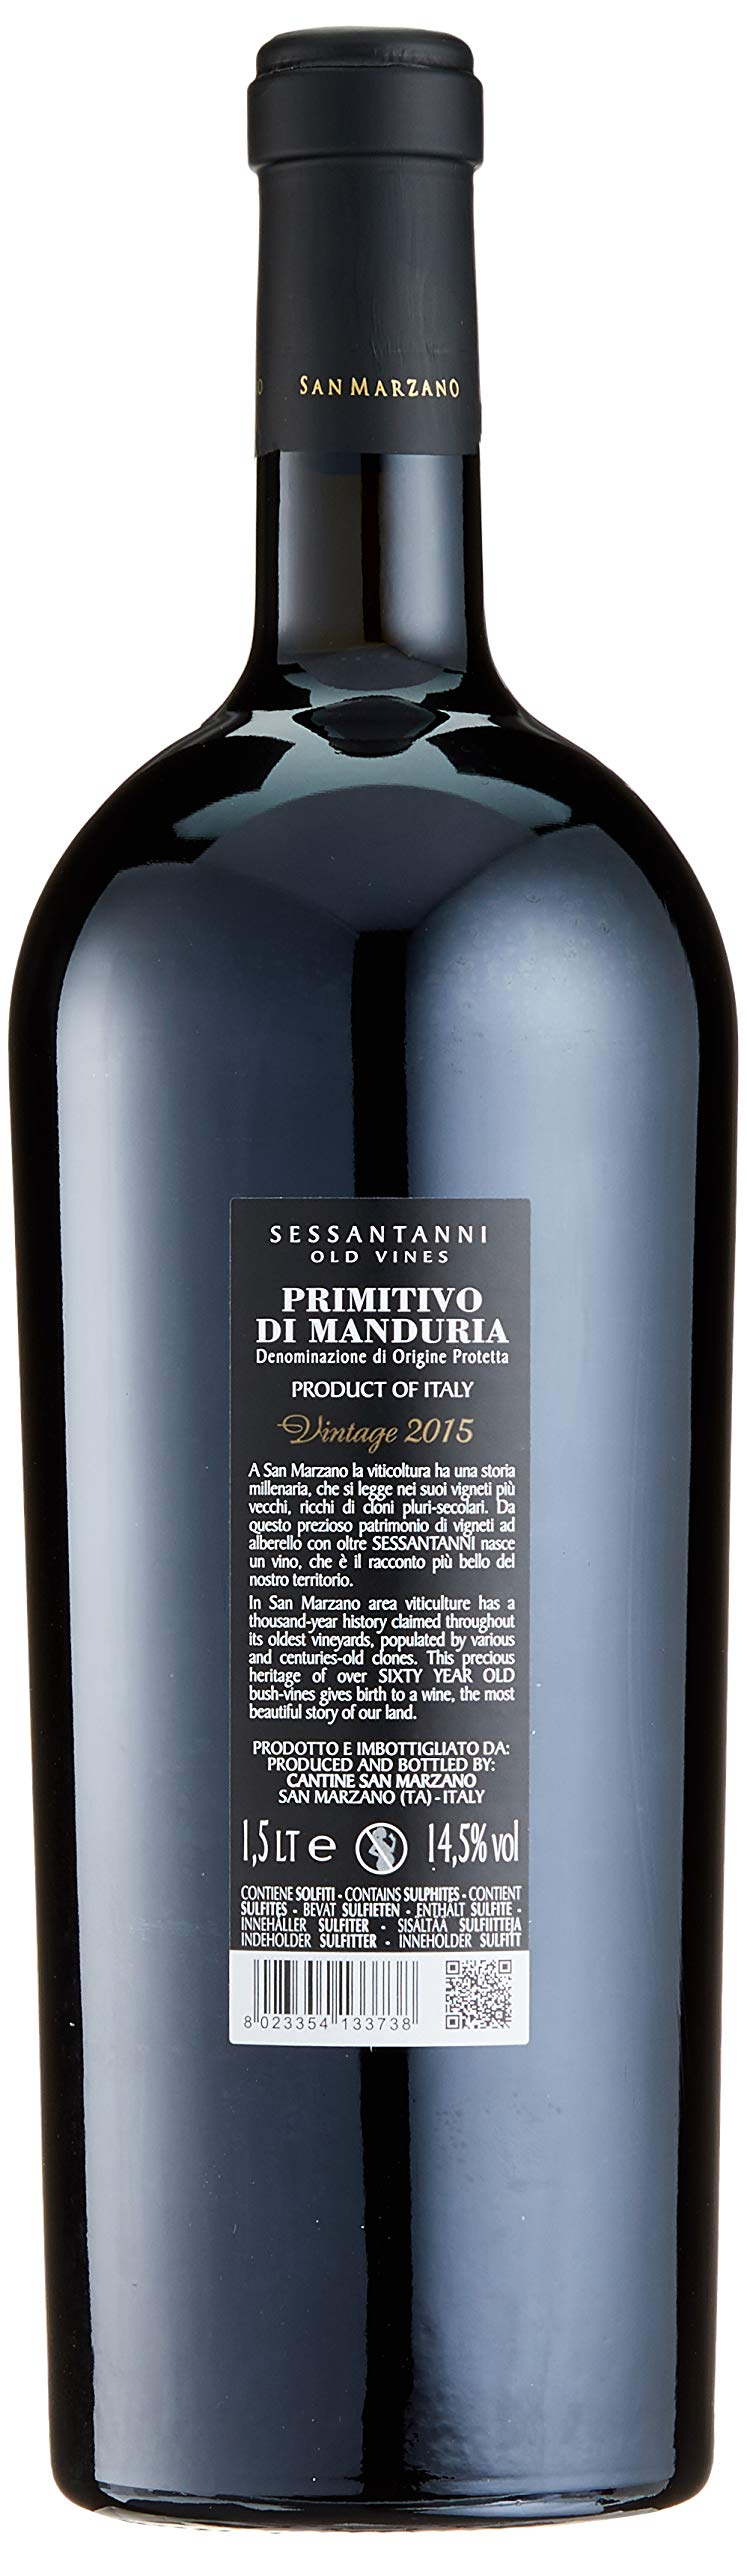 San-Marzano-Feudi-Di-Sessantanni-Primitivo-di-Manduria-DOC-2015-Magnum-trocken-15-l